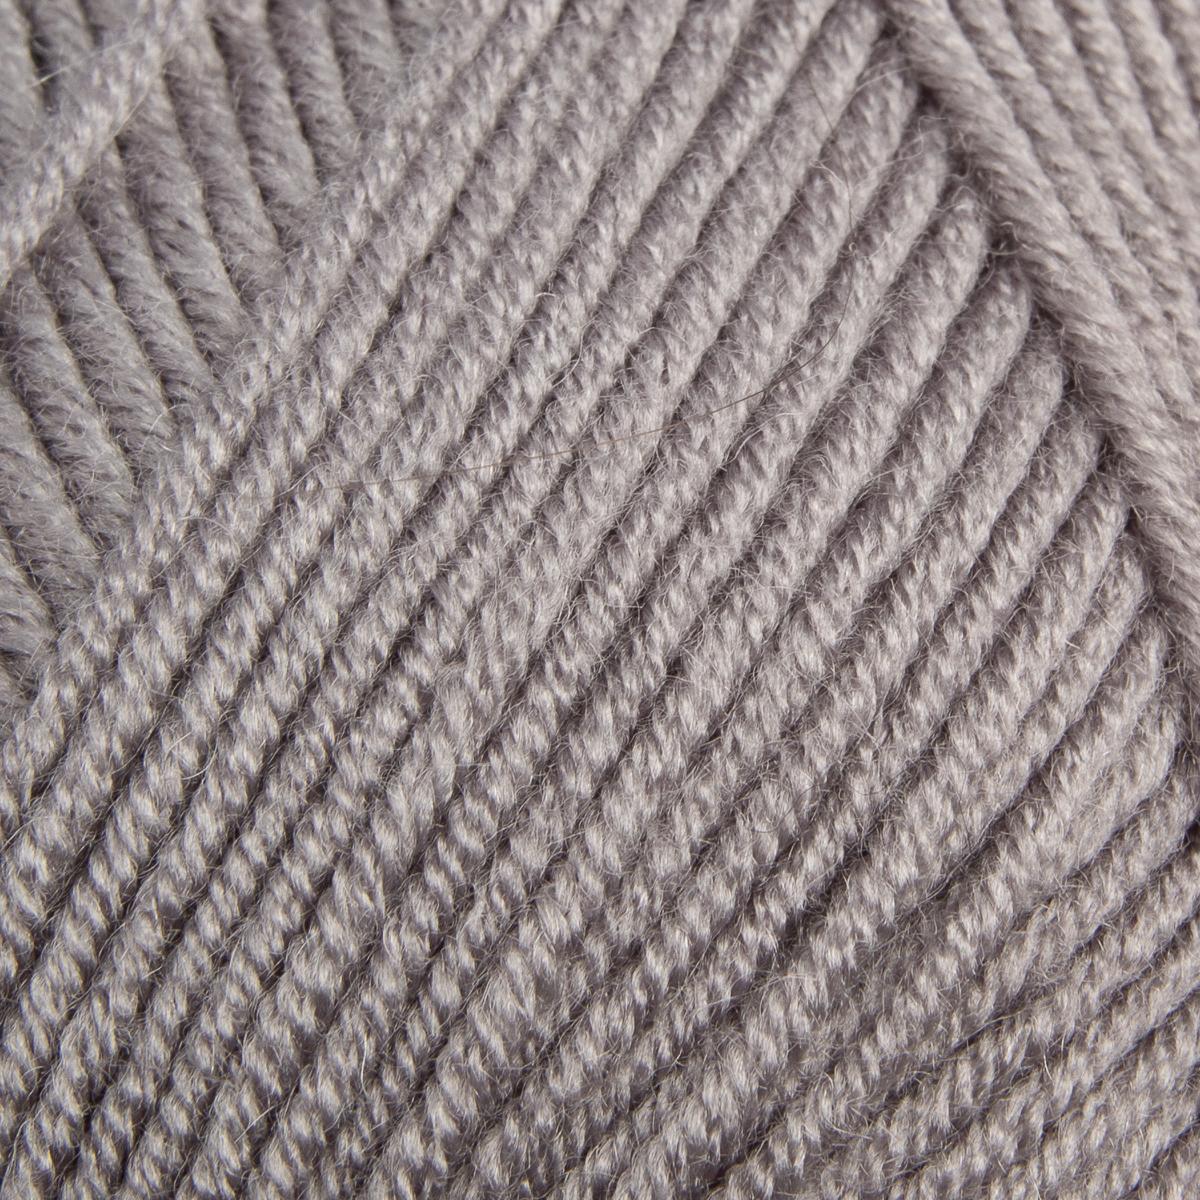 3pk-Lion-Brand-Vanna-039-s-Style-100-Acrylic-Yarn-Light-3-Knit-Crochet-Skeins-Soft thumbnail 12